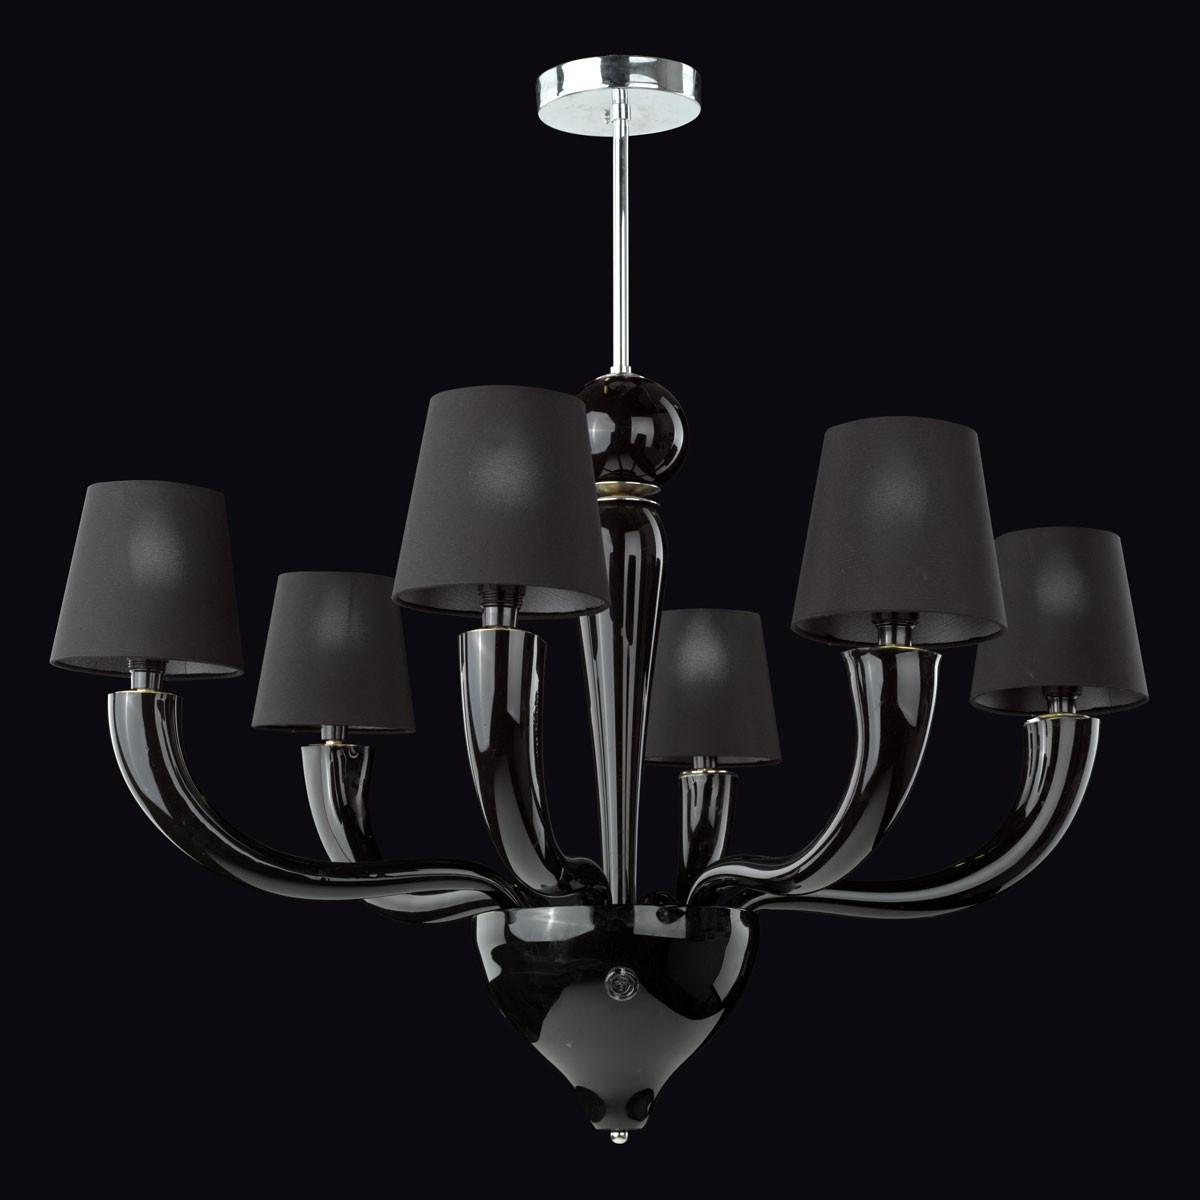 """Onice"" Murano glass chandelier - 6 lights"